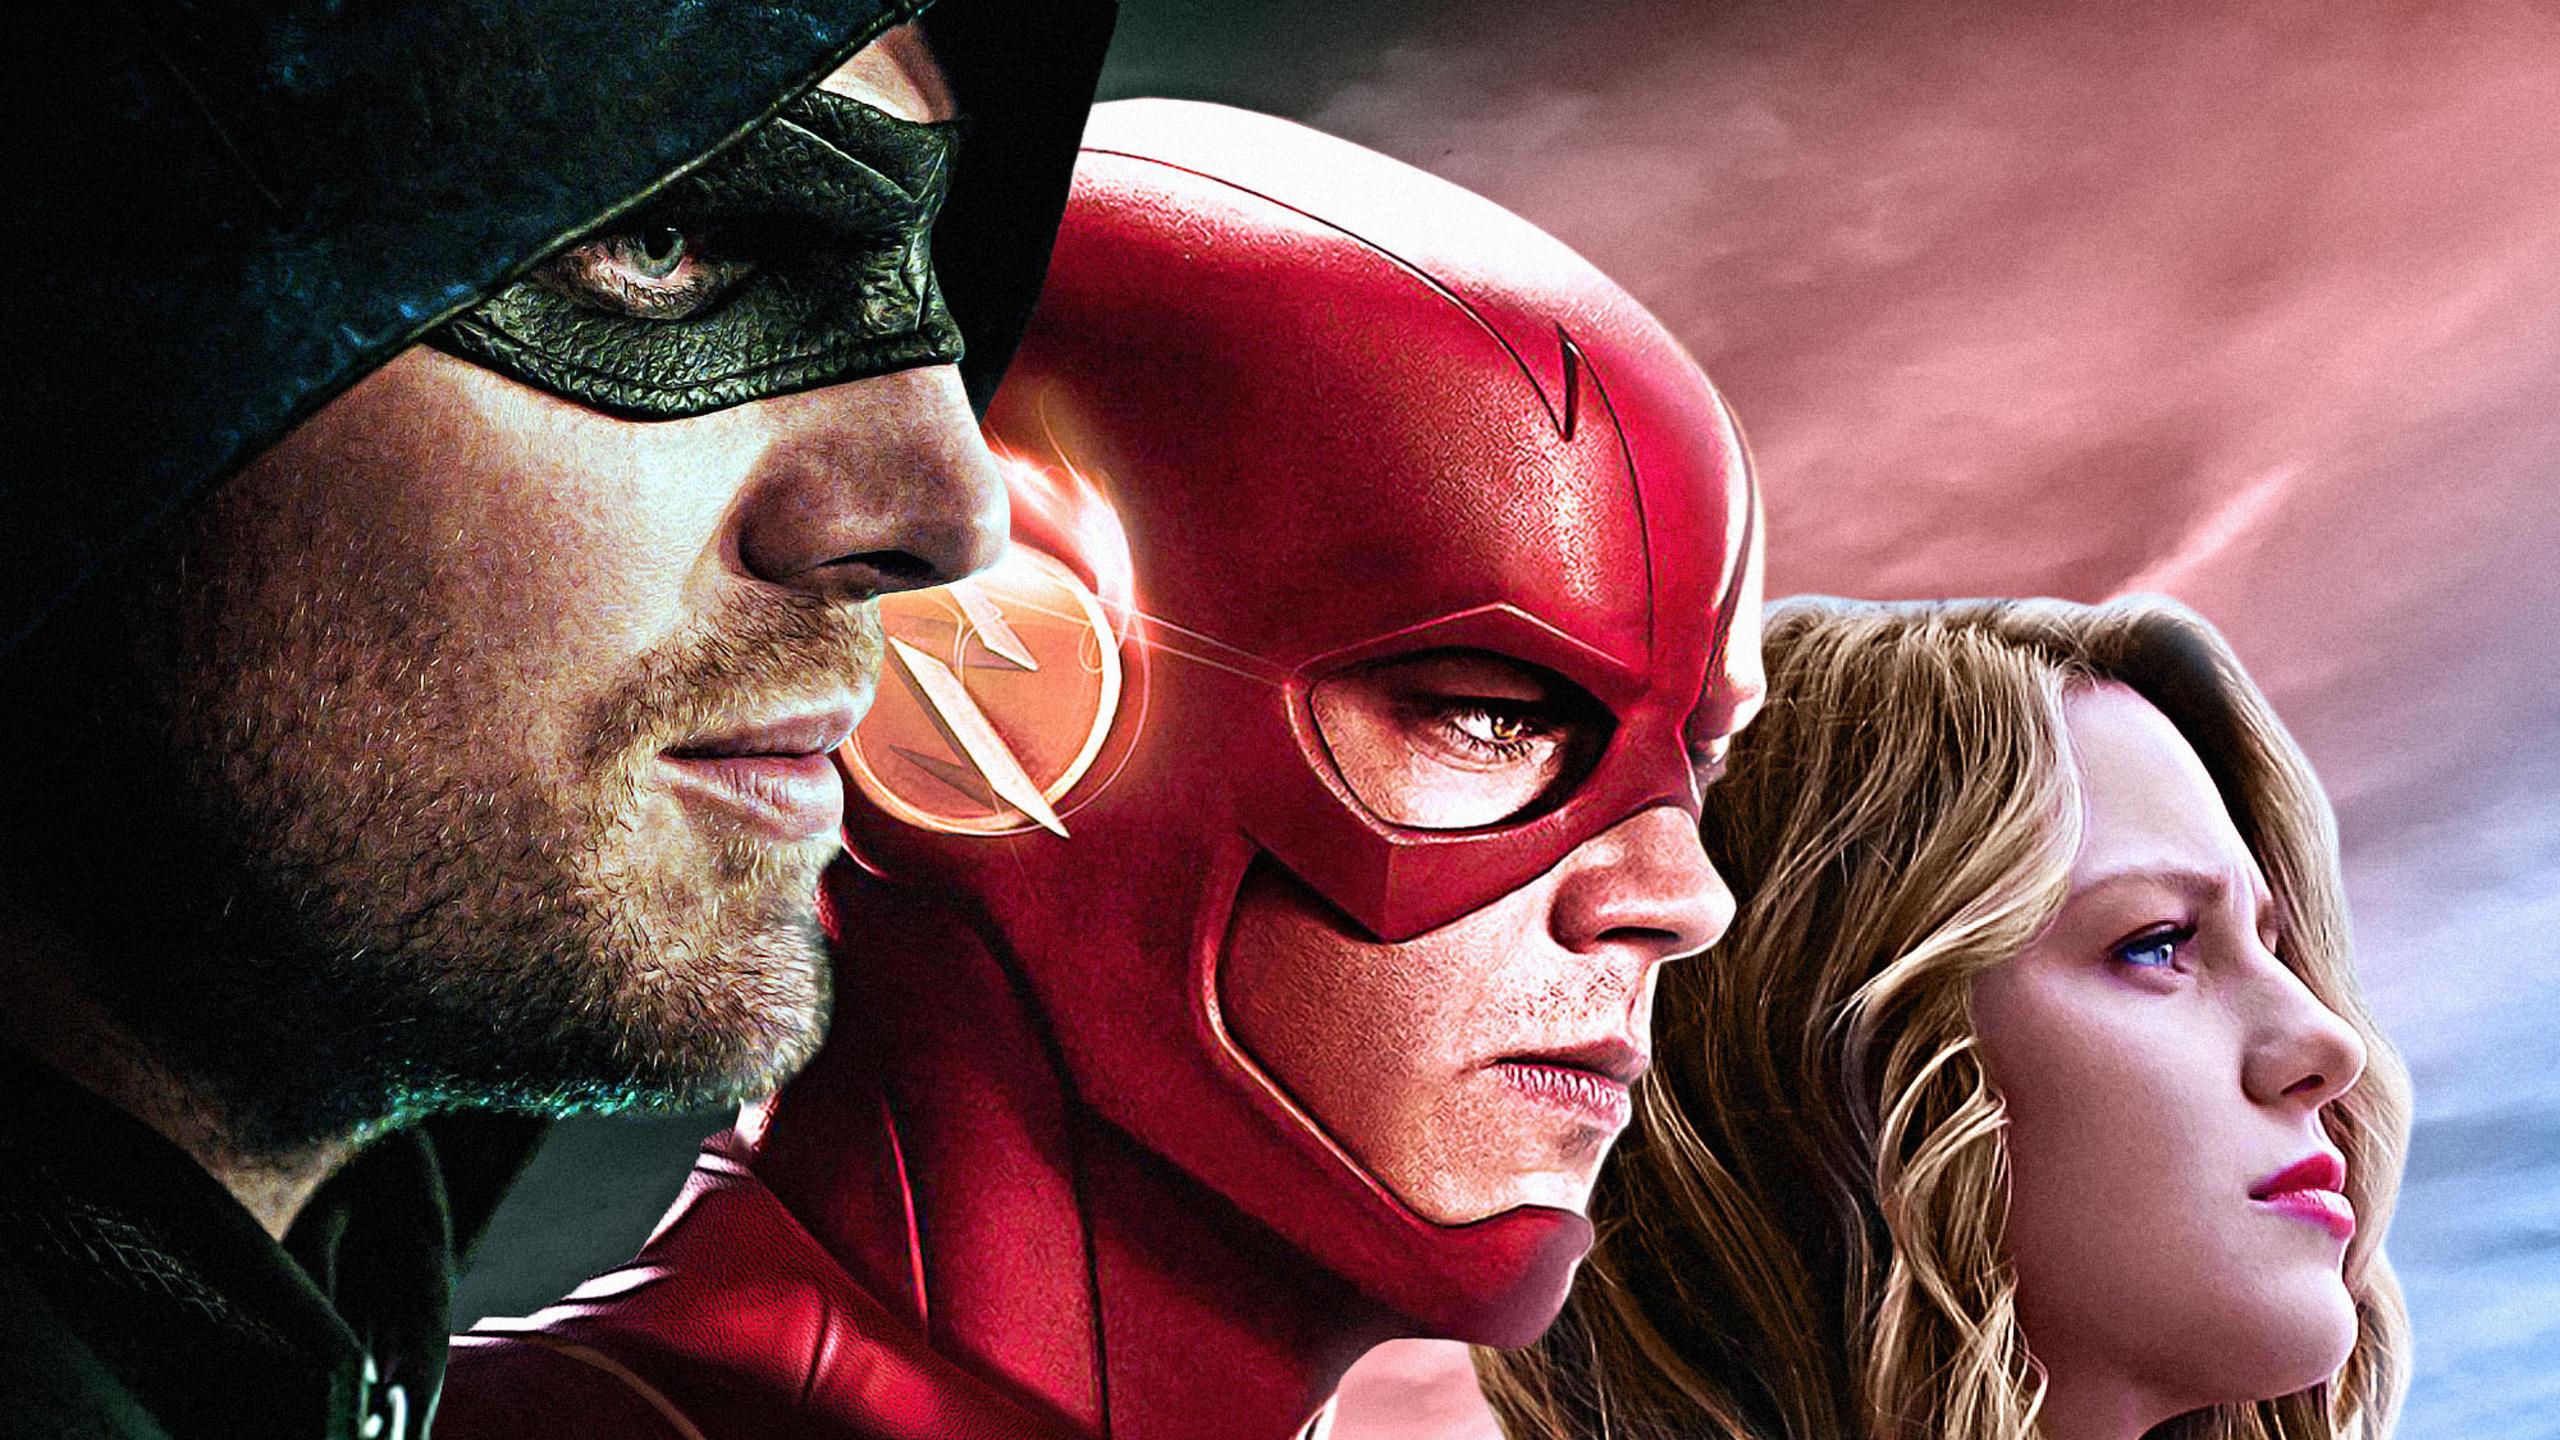 2560x1440 Dc Tv Arrow Flash Supergirl 1440p Resolution Hd 4k